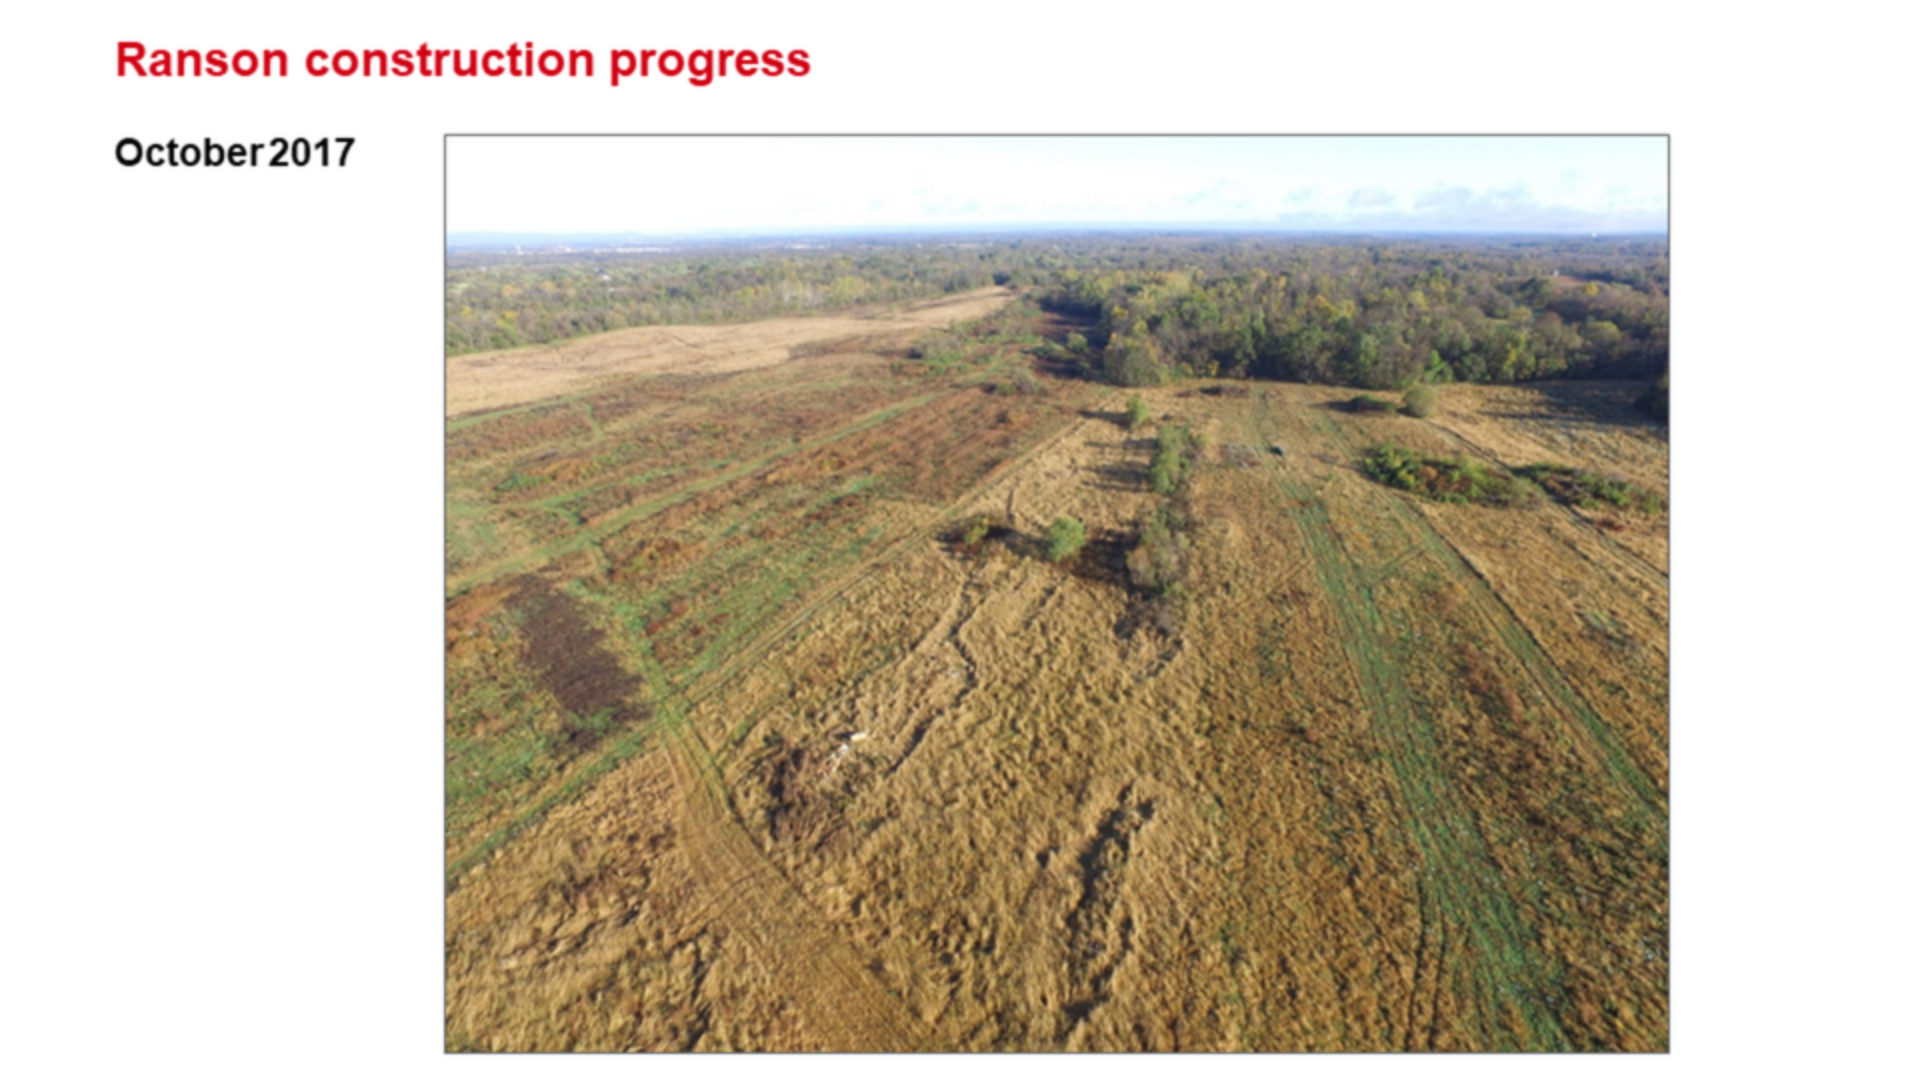 ROCKWOOL Ranson (Jefferson County) WV Construction Progress October 2017.